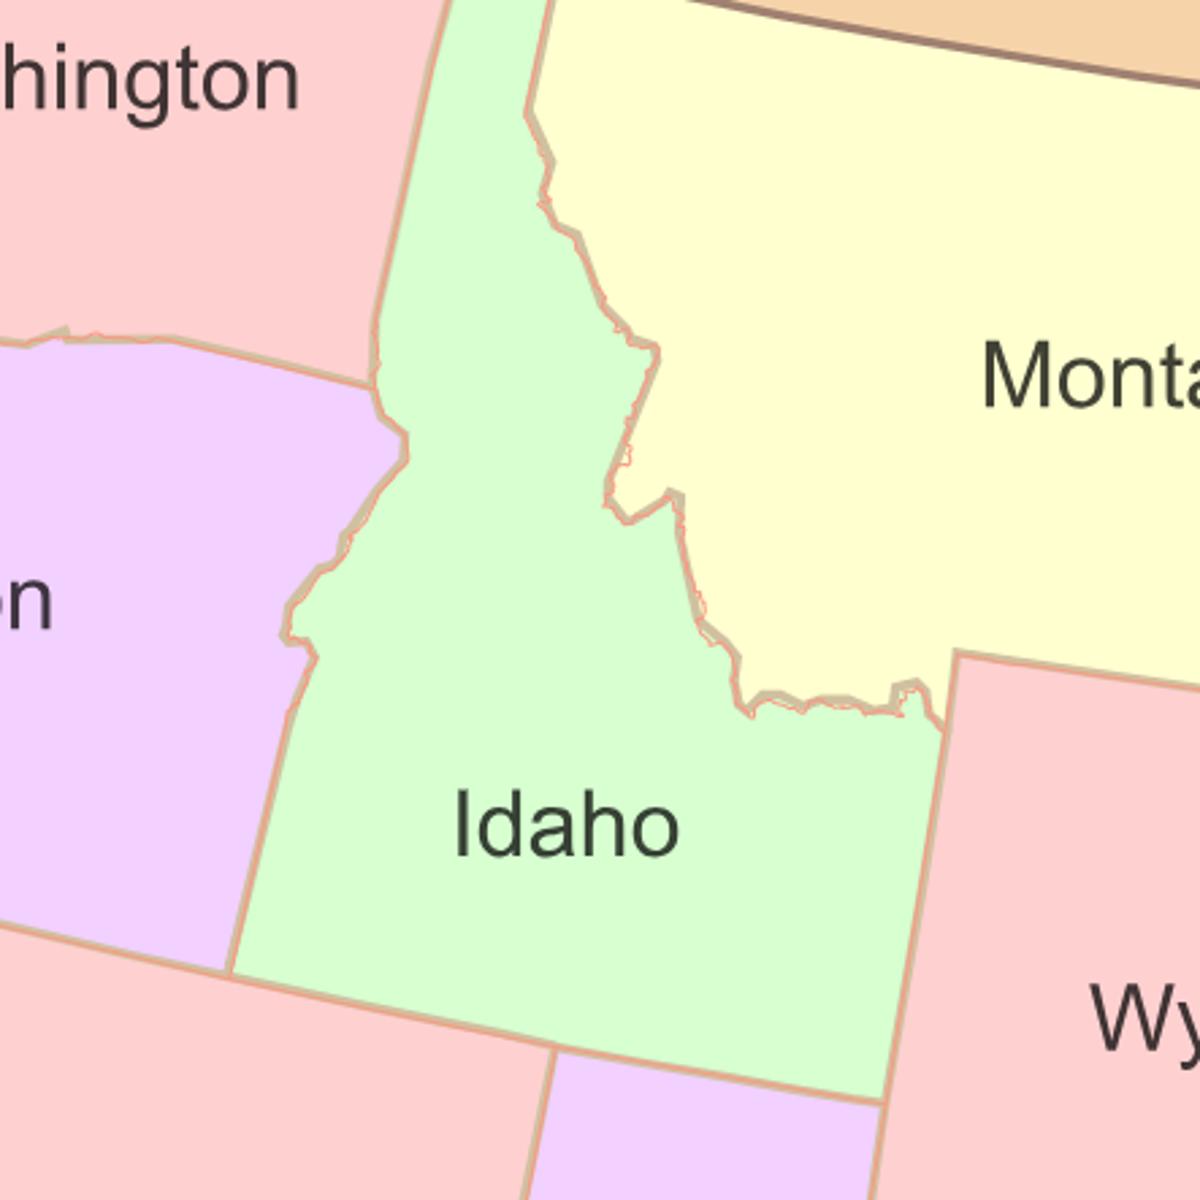 idaho and washington map Proposed 51st State Would Include Parts Of Idaho Washington idaho and washington map